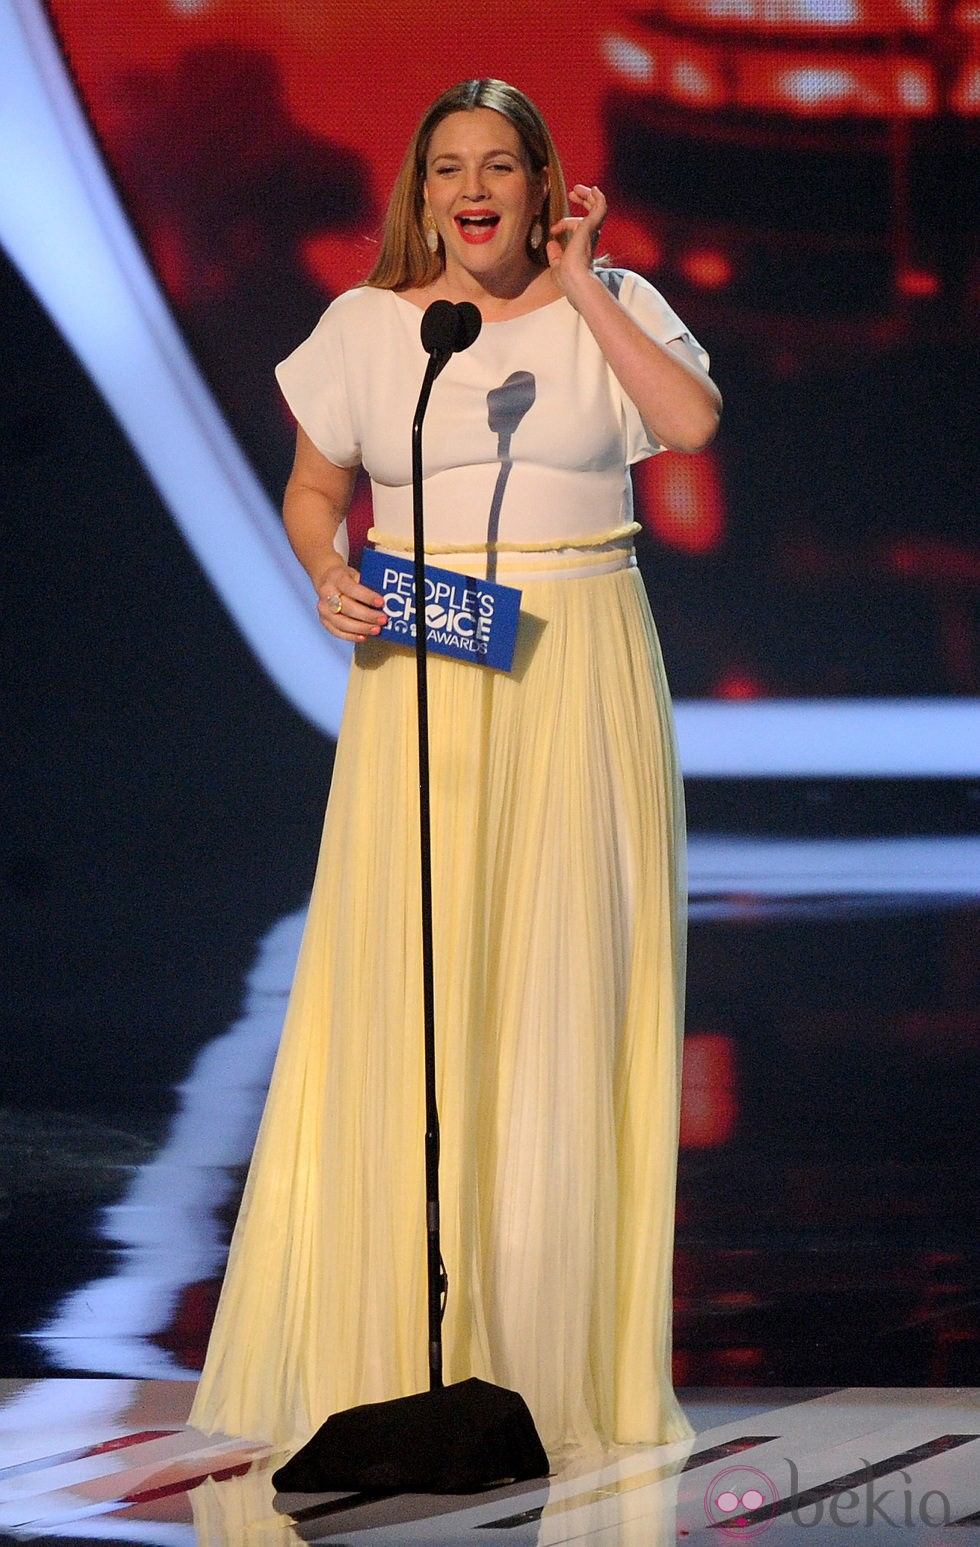 Drew Barrymore en los People's Choice Awards 2014